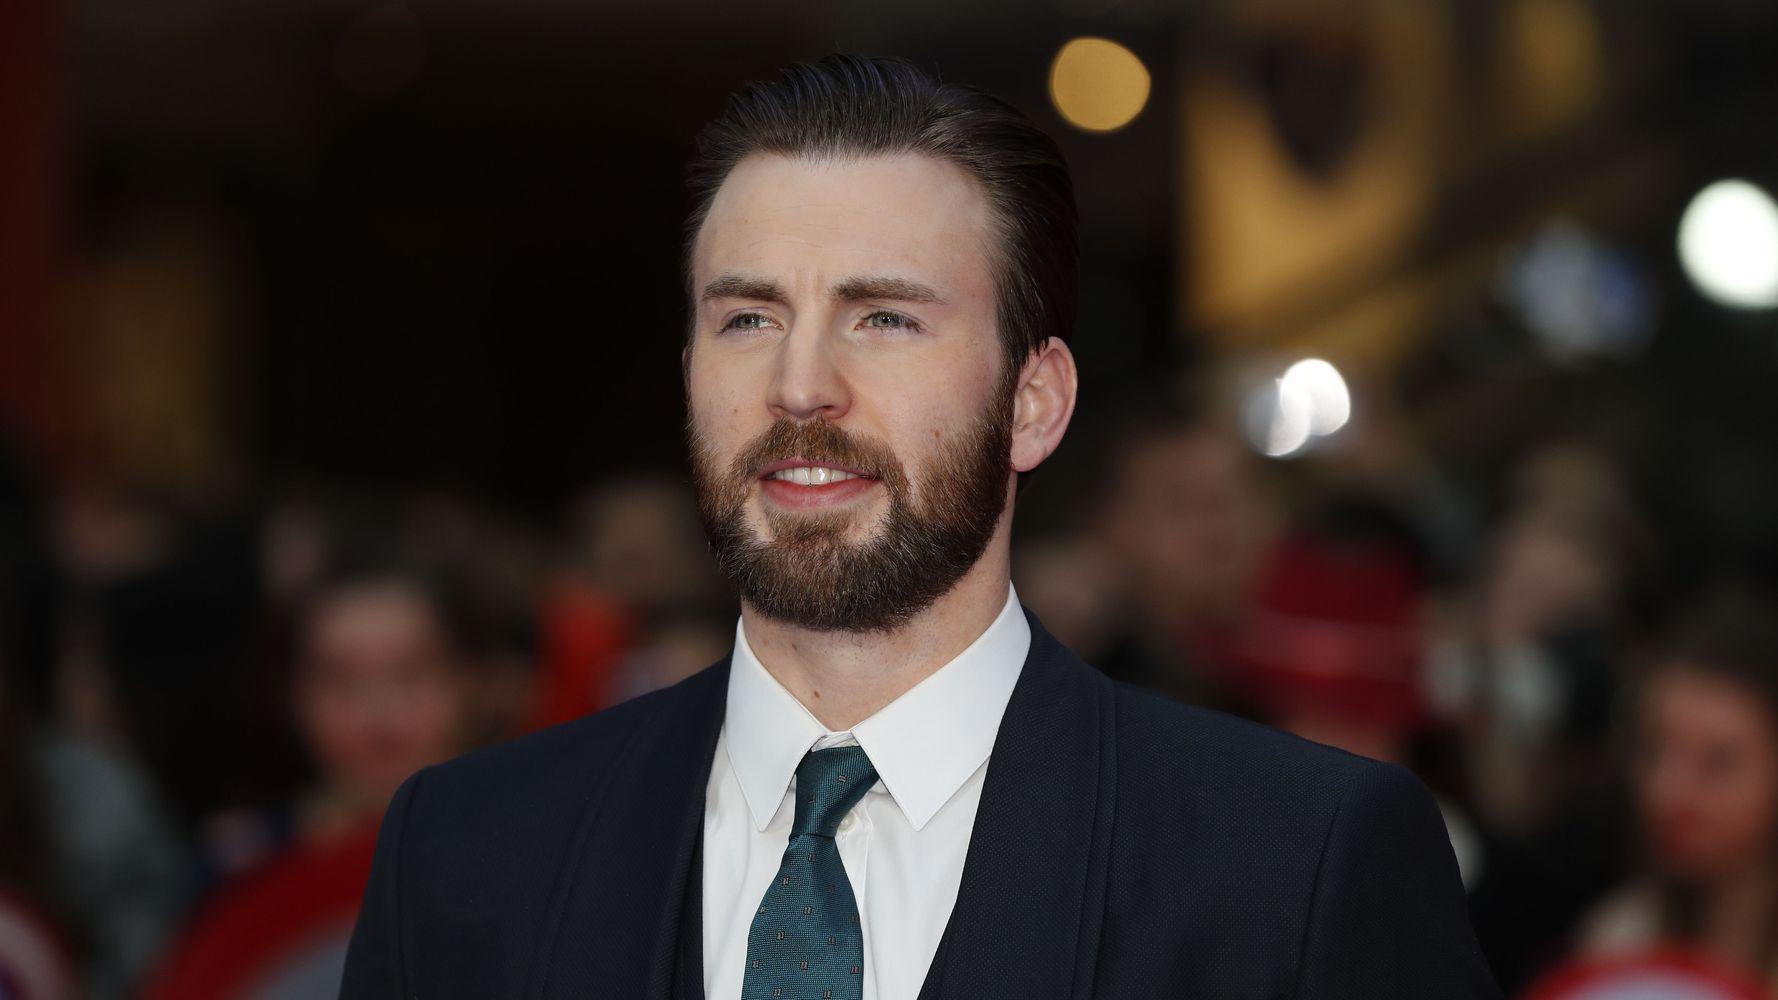 Trump Refused To Meet With Captain America Himself, Chris Evans